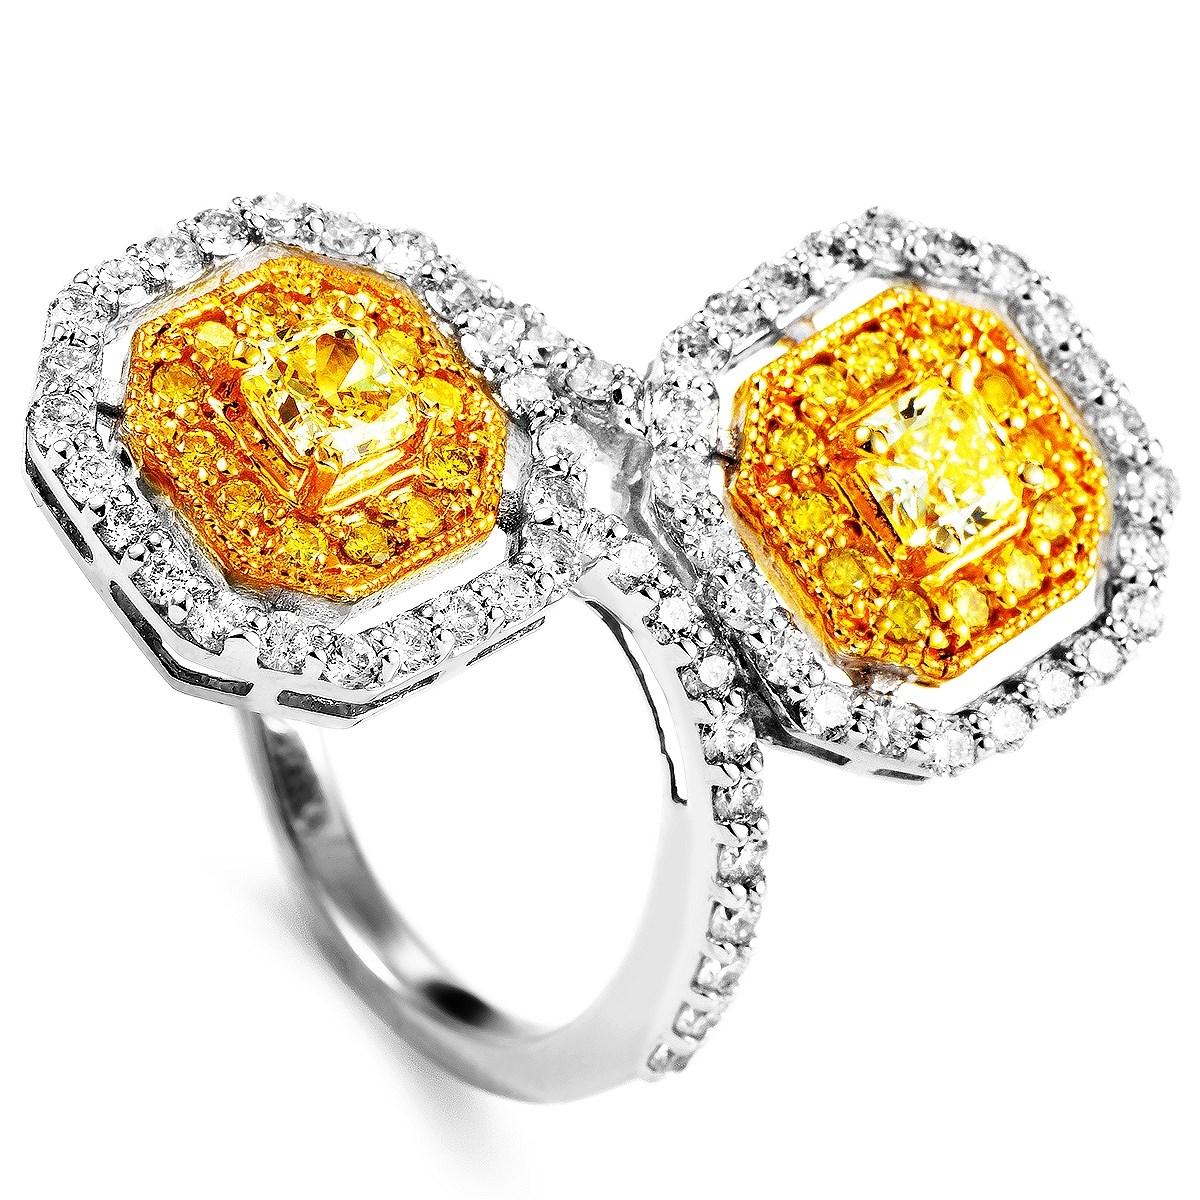 18K Multi-Gold & Diamond Ring MFC22-011315